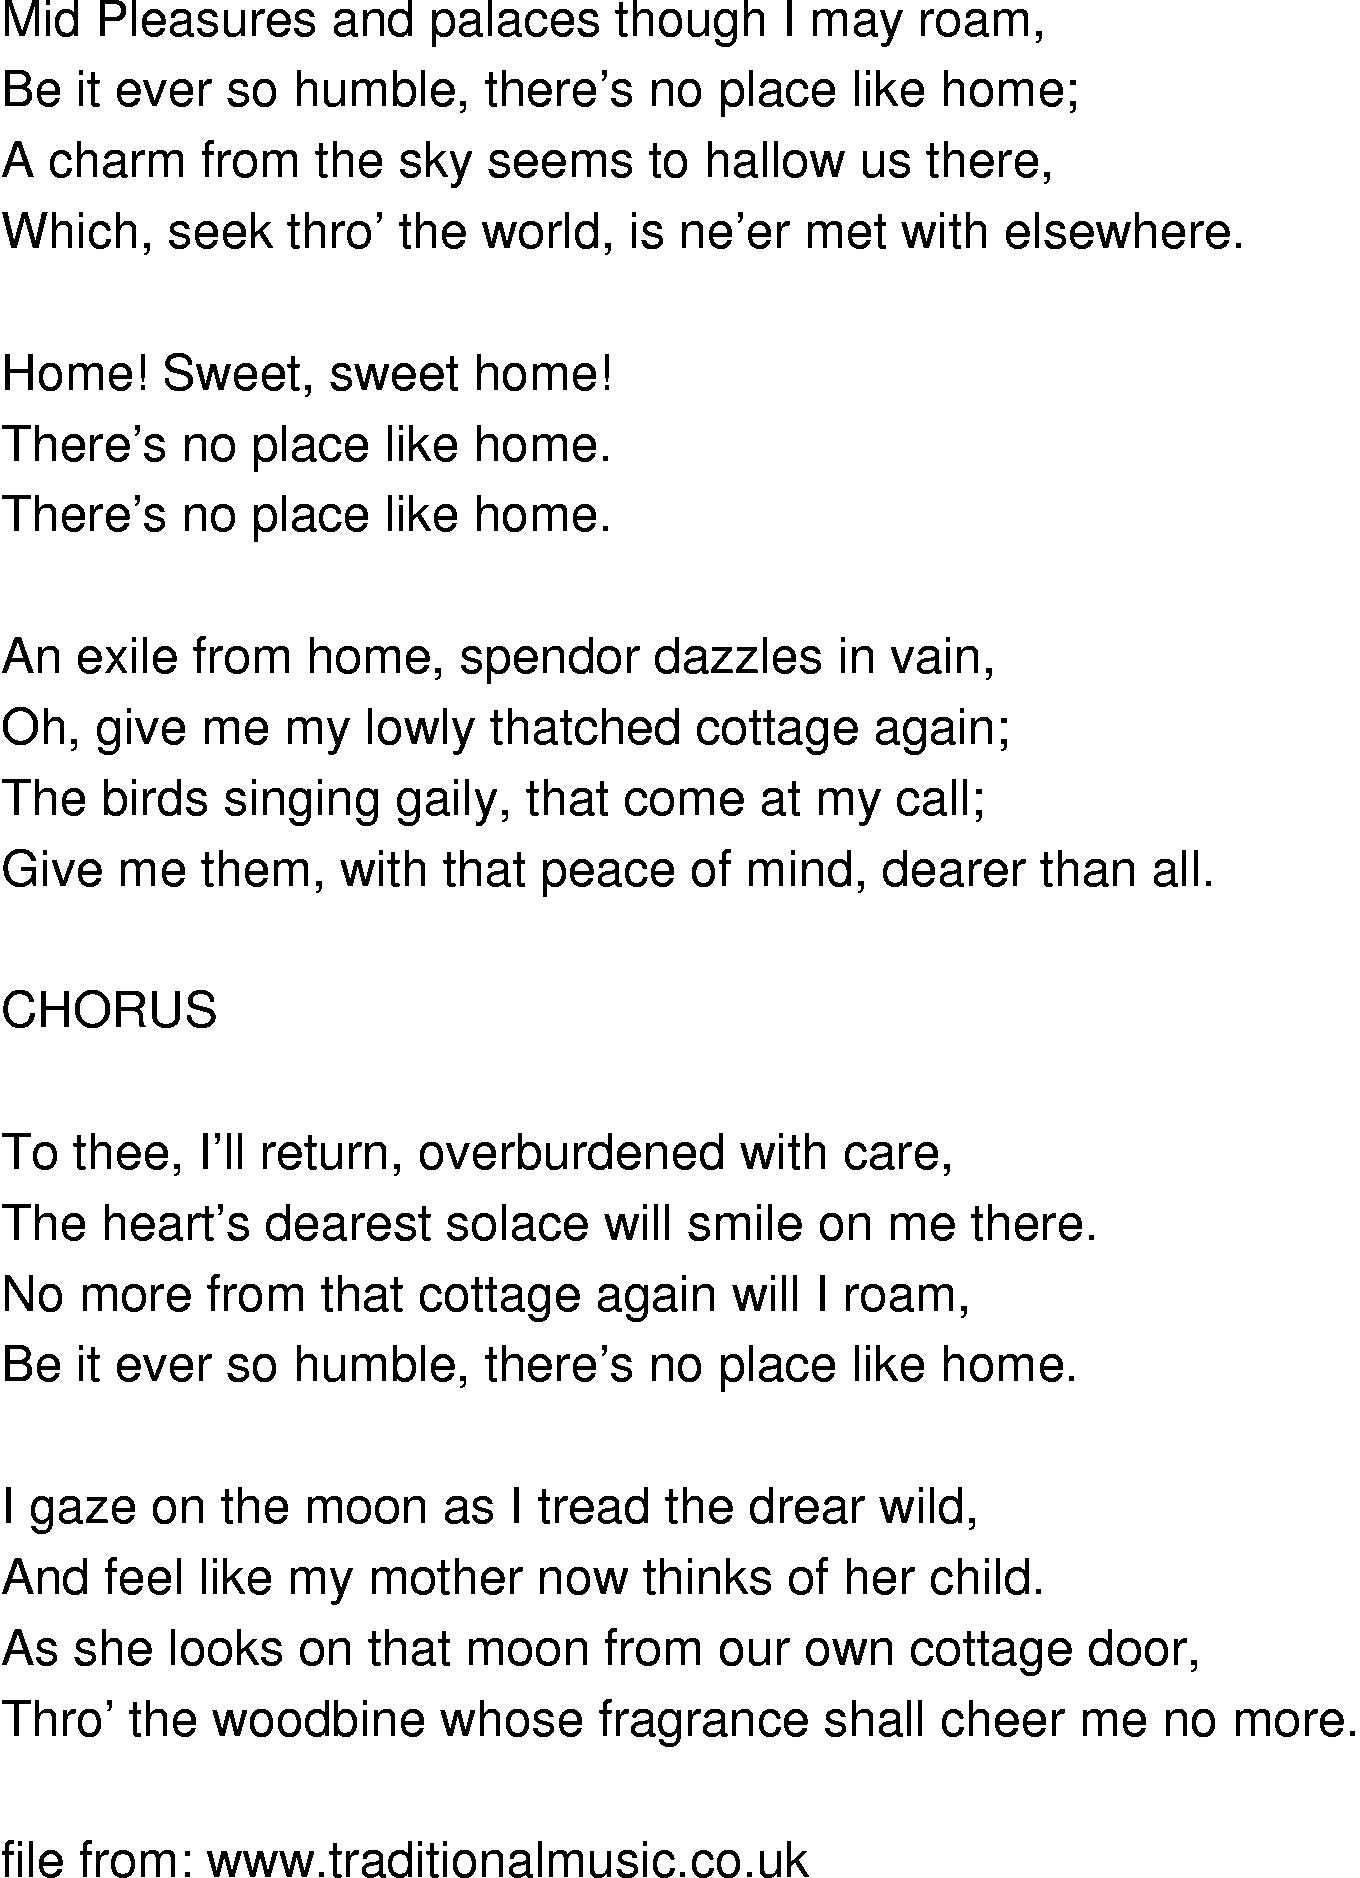 Dec 25, 2020· sweet home lyrics: Old Time Song Lyrics Home Sweet Home